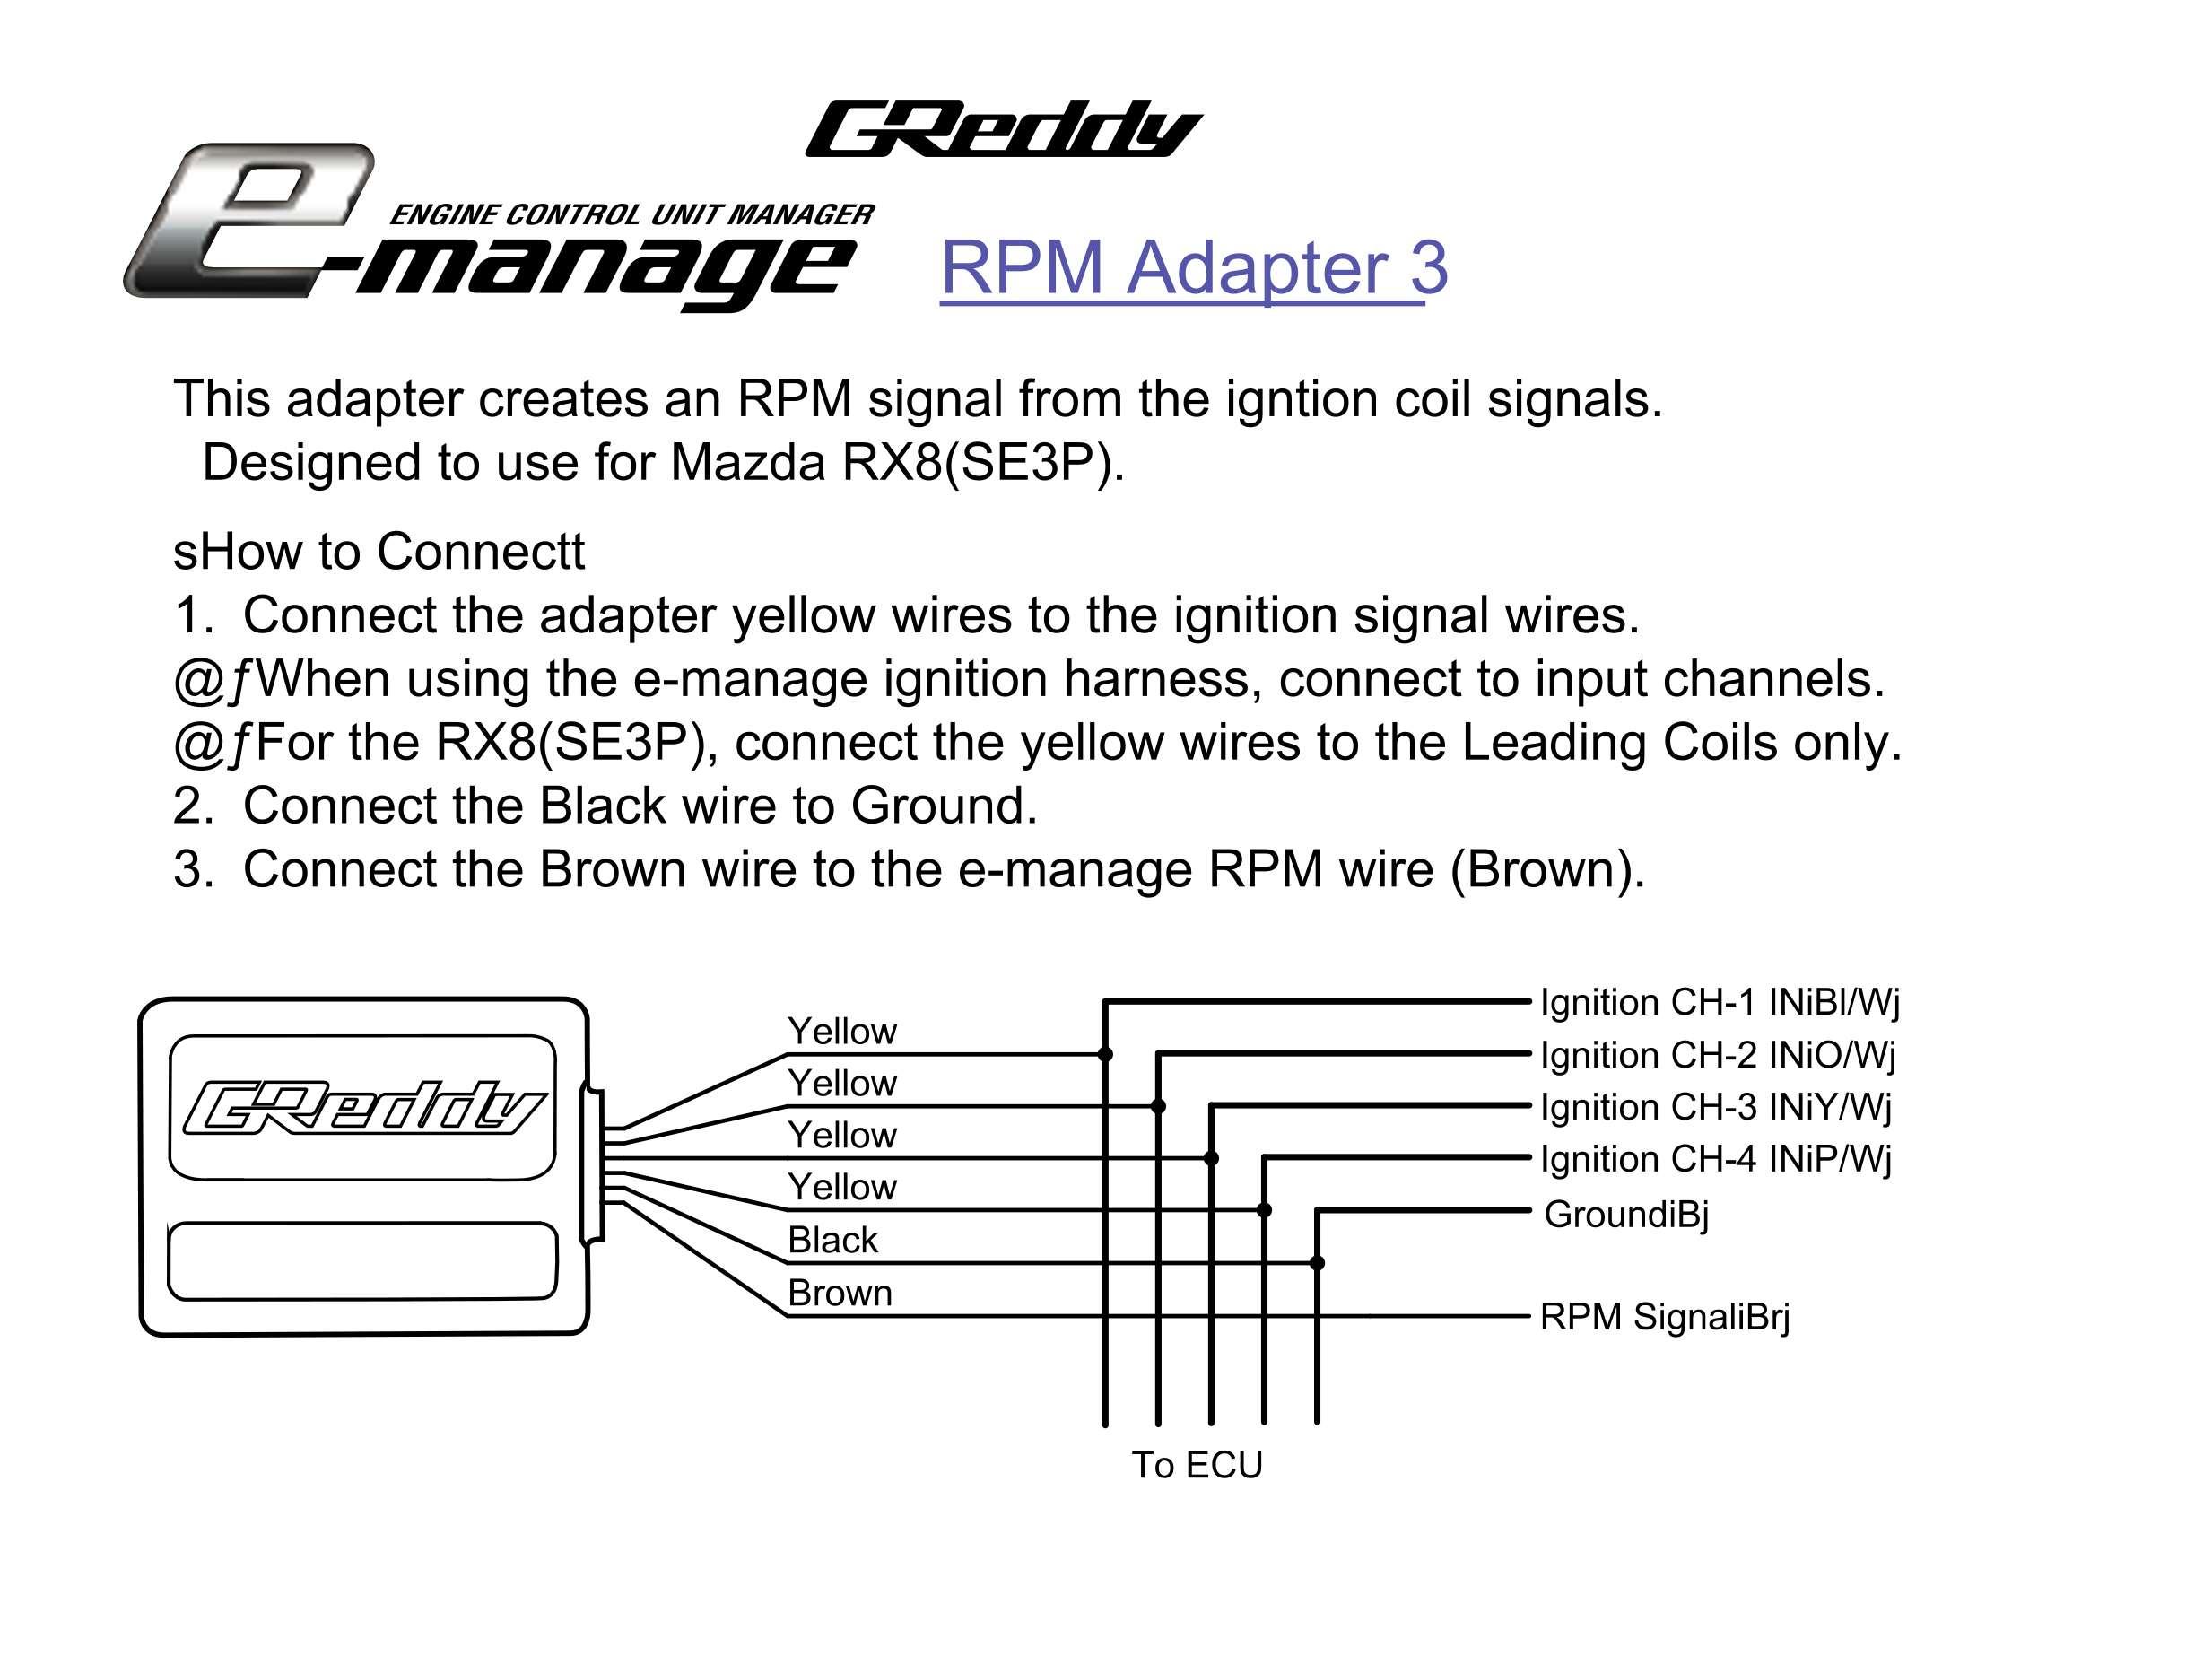 Wankelshop Greddy Rpm Signal Adapter 3 Rx8 Wiring Harness